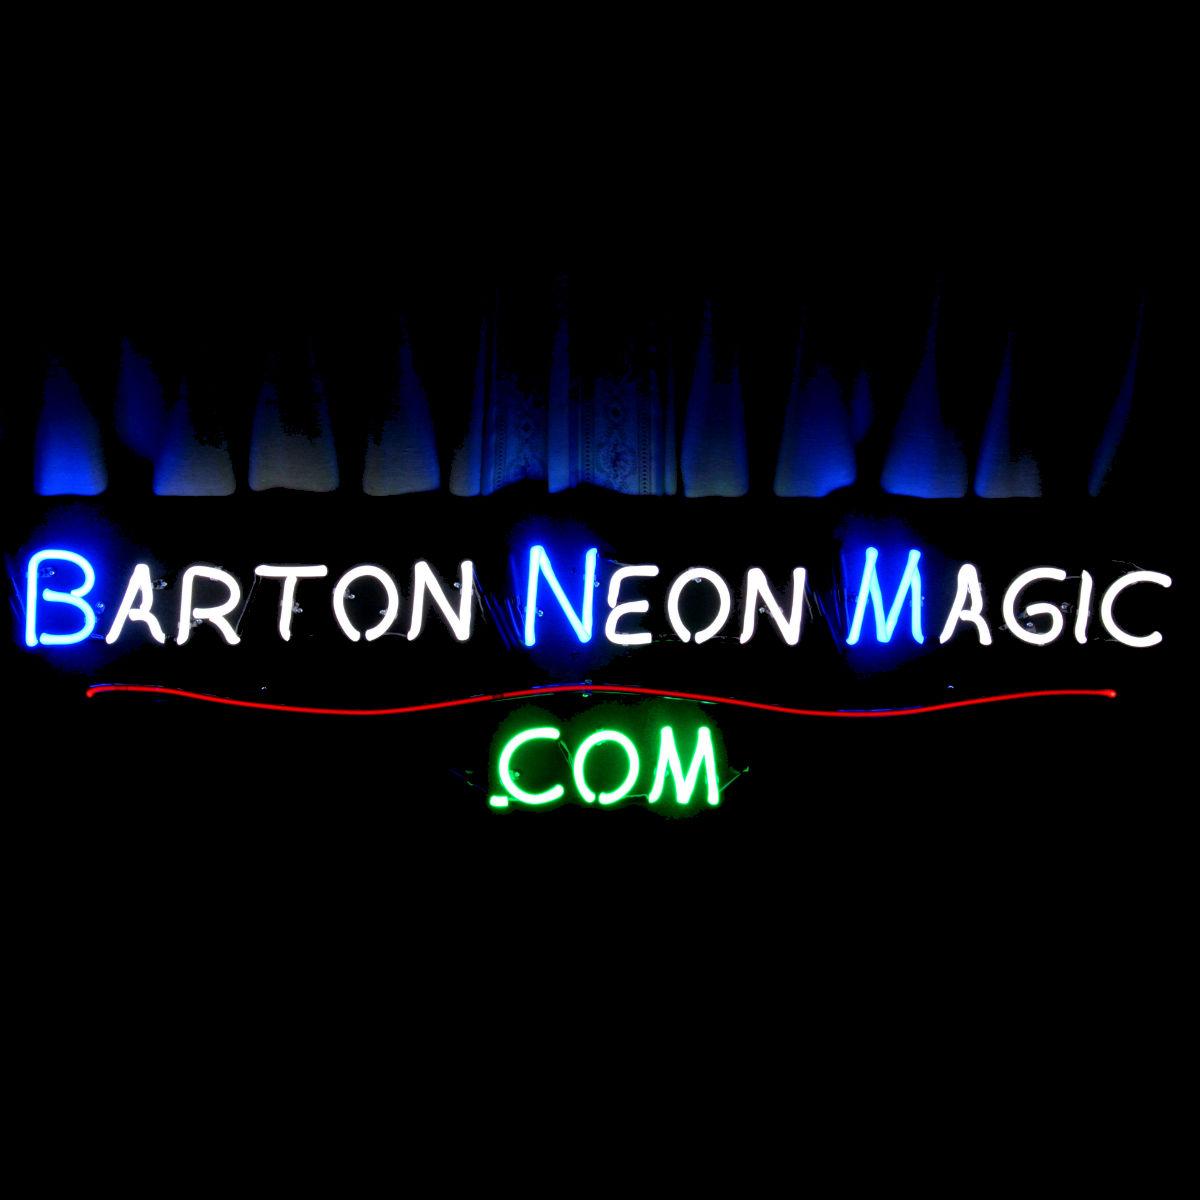 Custom Neon Artworks by John Barton - BartonNeonMagic.com